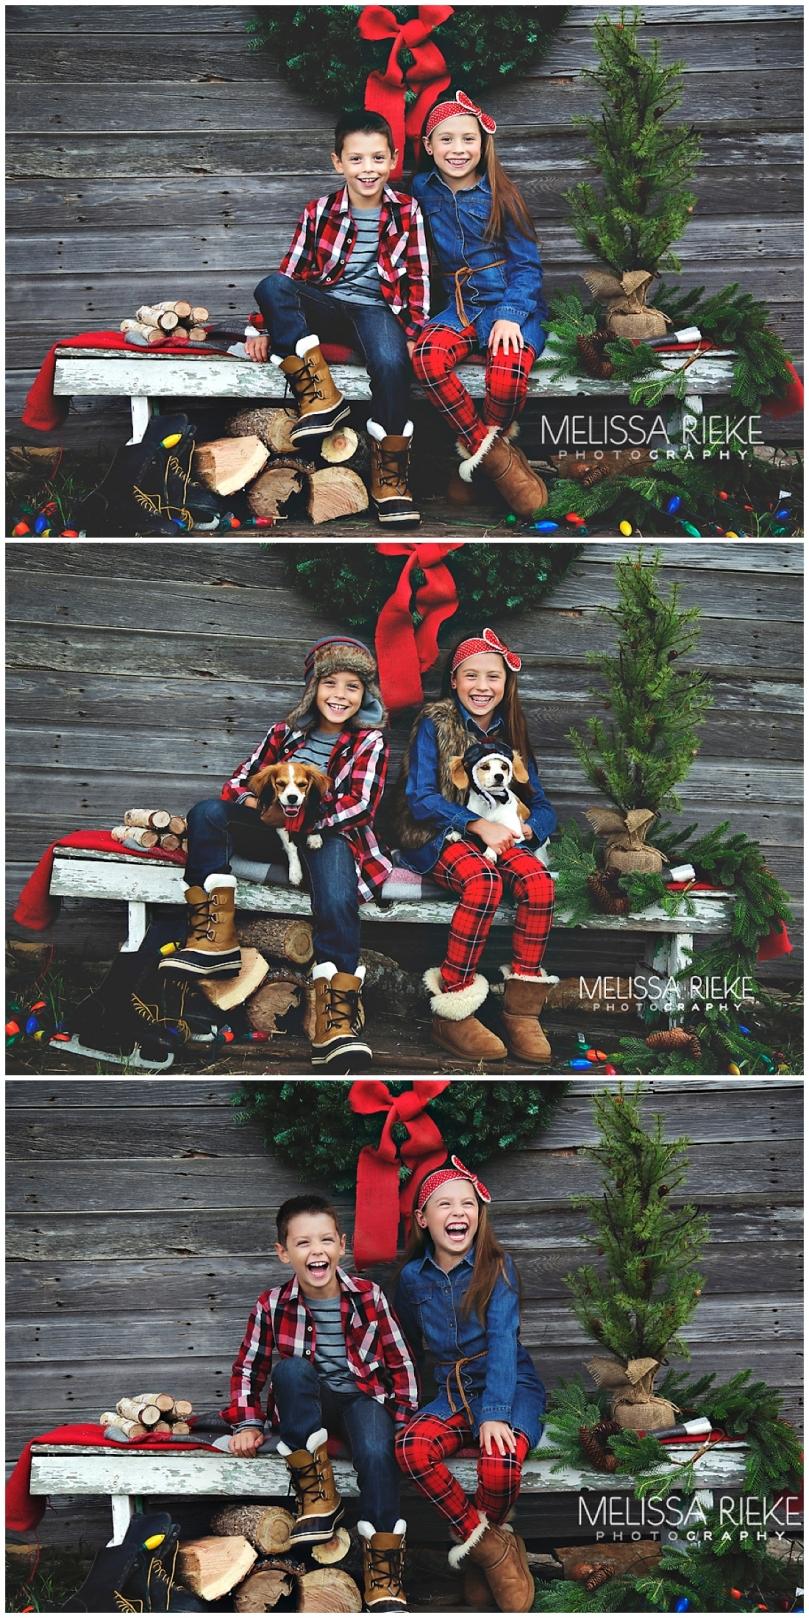 Holiday Hoopla Christmas Plaid Minis Boots Flannel Kansas City Photographer